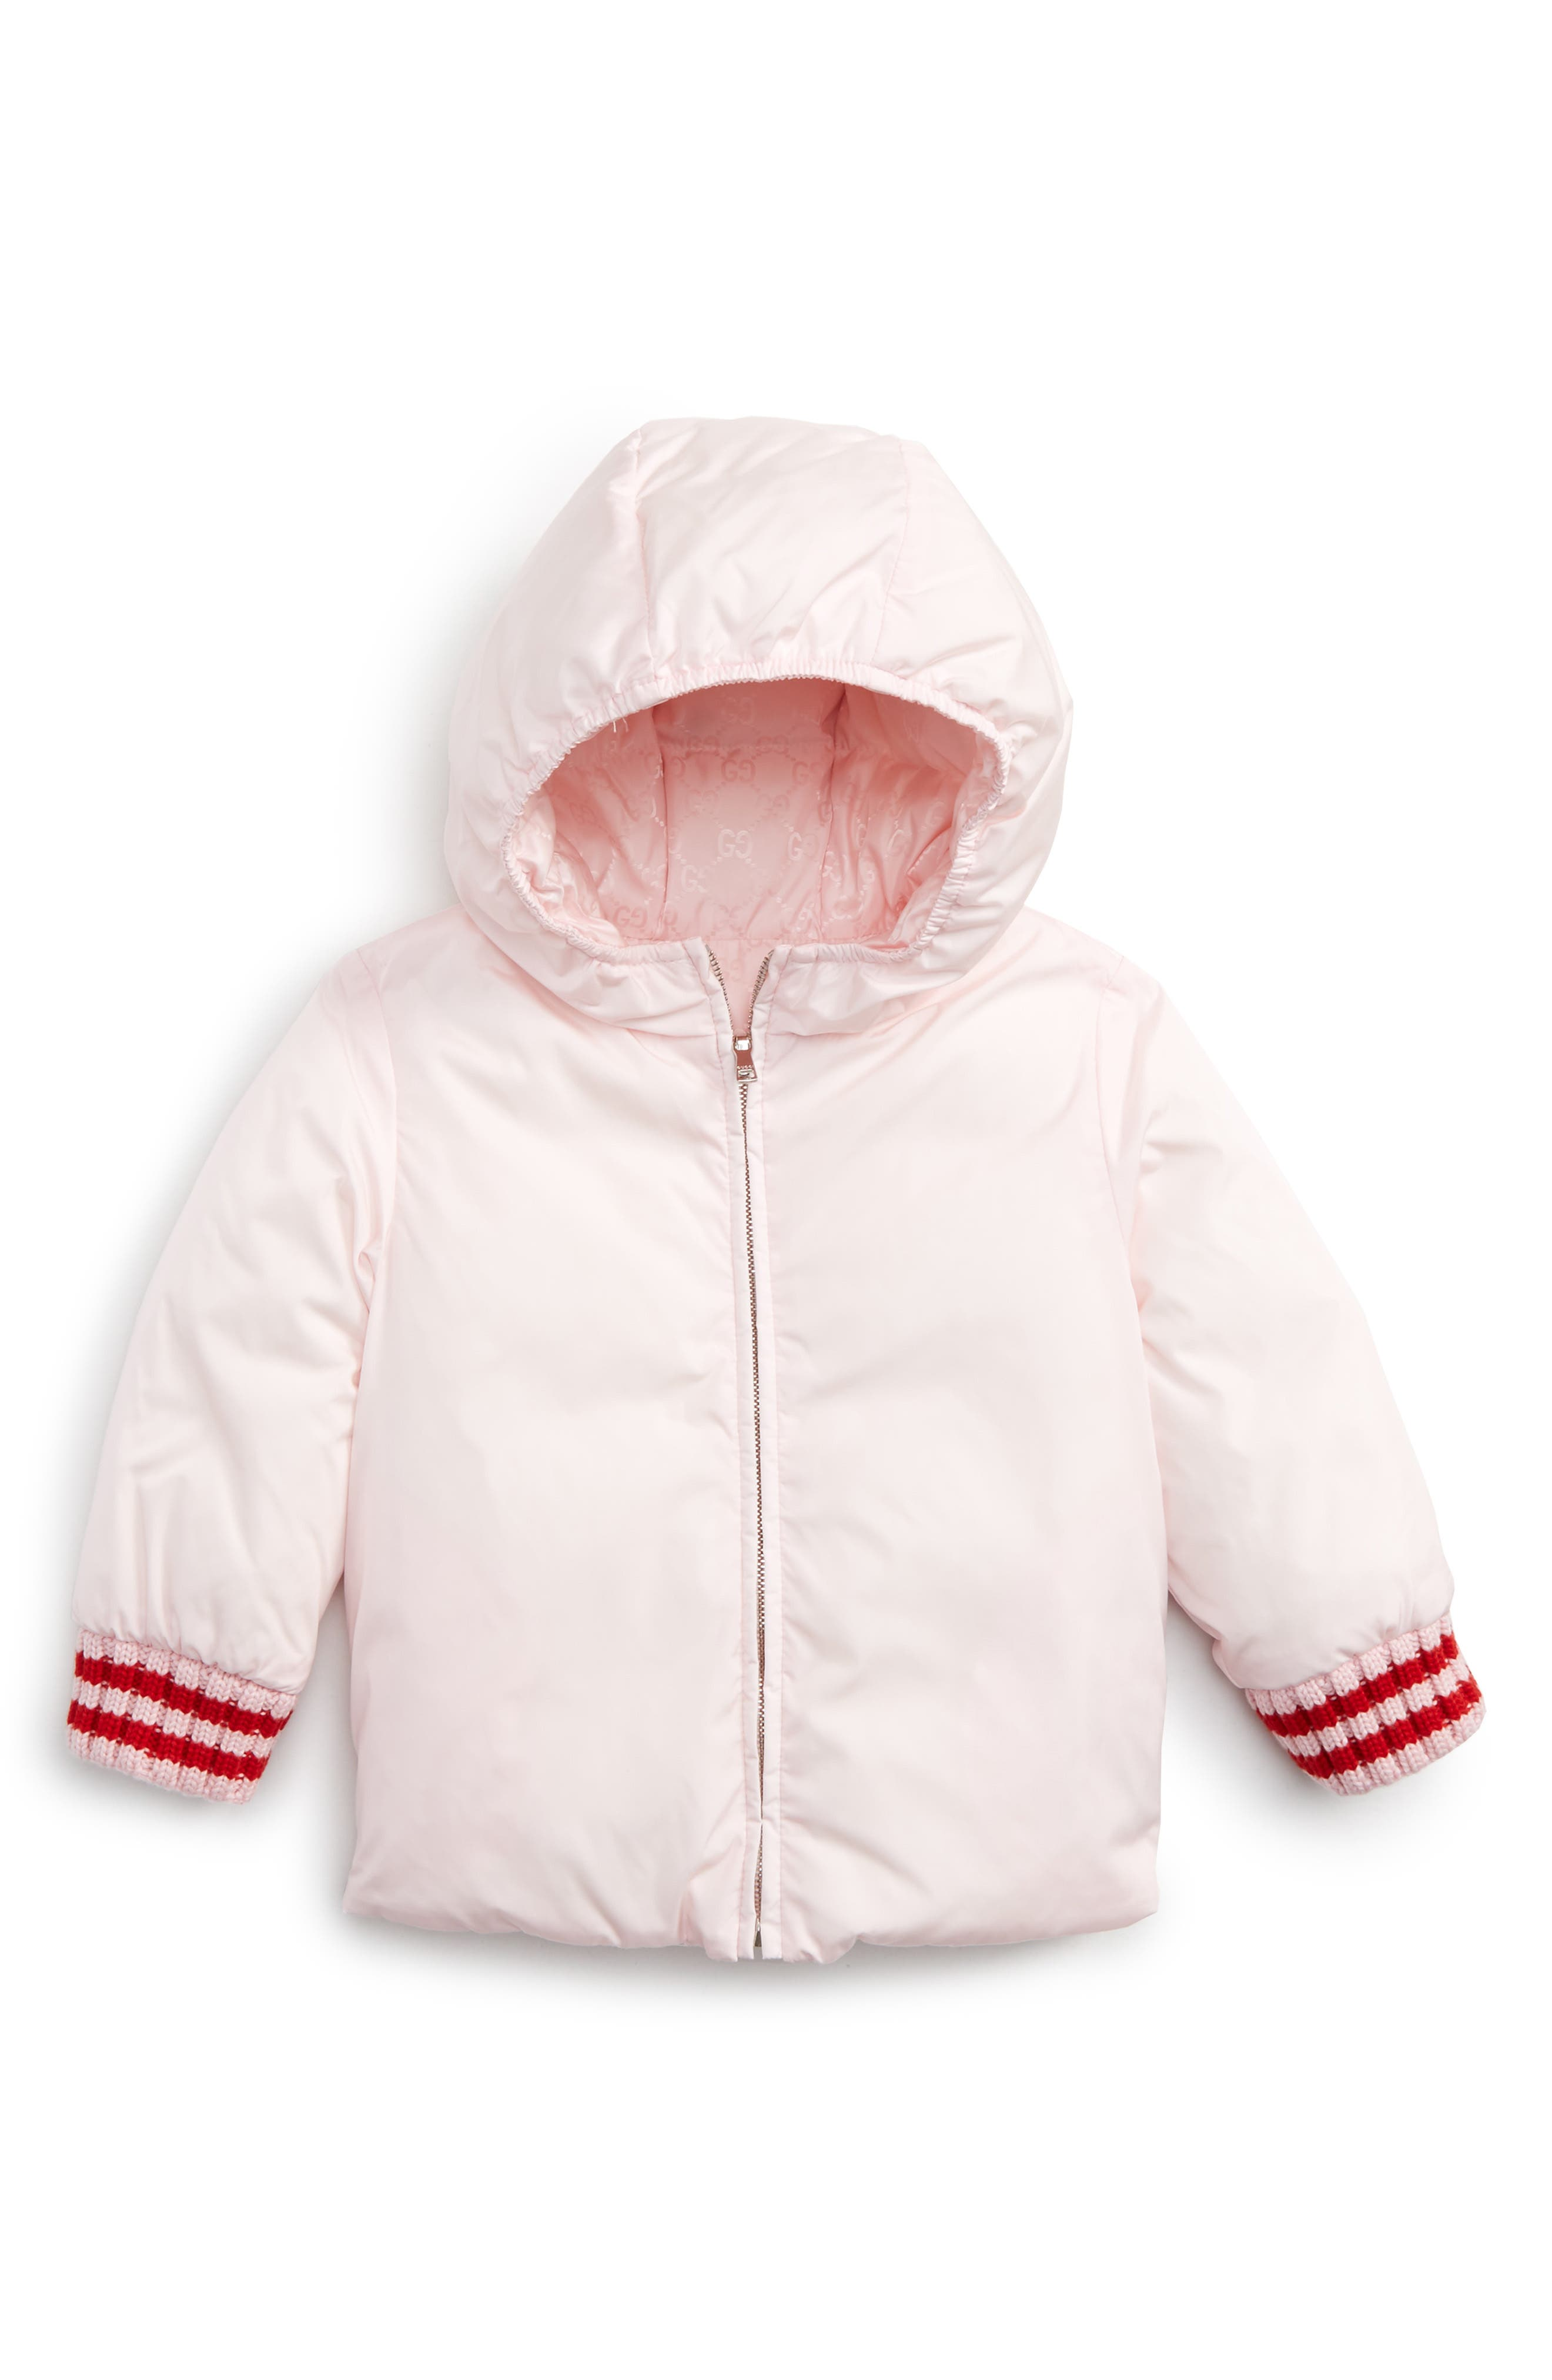 Reversible GG Jacquard Water-Resistant Down Jacket,                         Main,                         color, 667